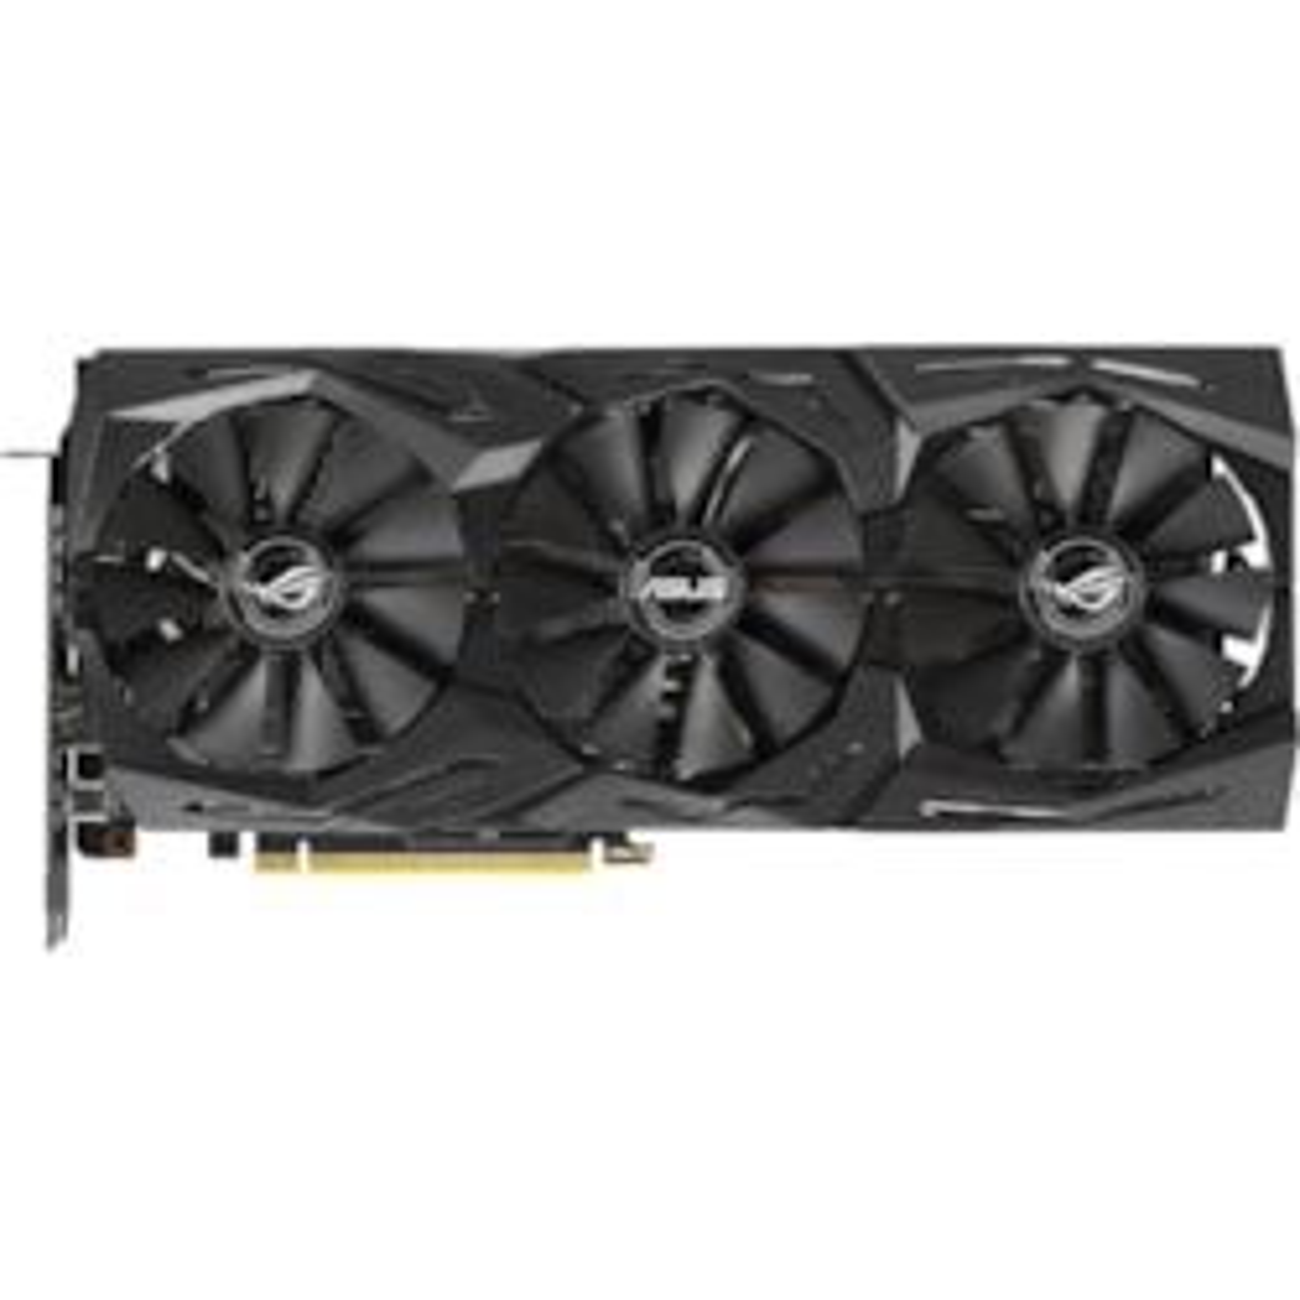 Asus ROG Strix ROG-STRIX-RTX2060S-A8G-GAMING GeForce RTX 2060 SUPER Graphic Card - 8 GB GDDR6